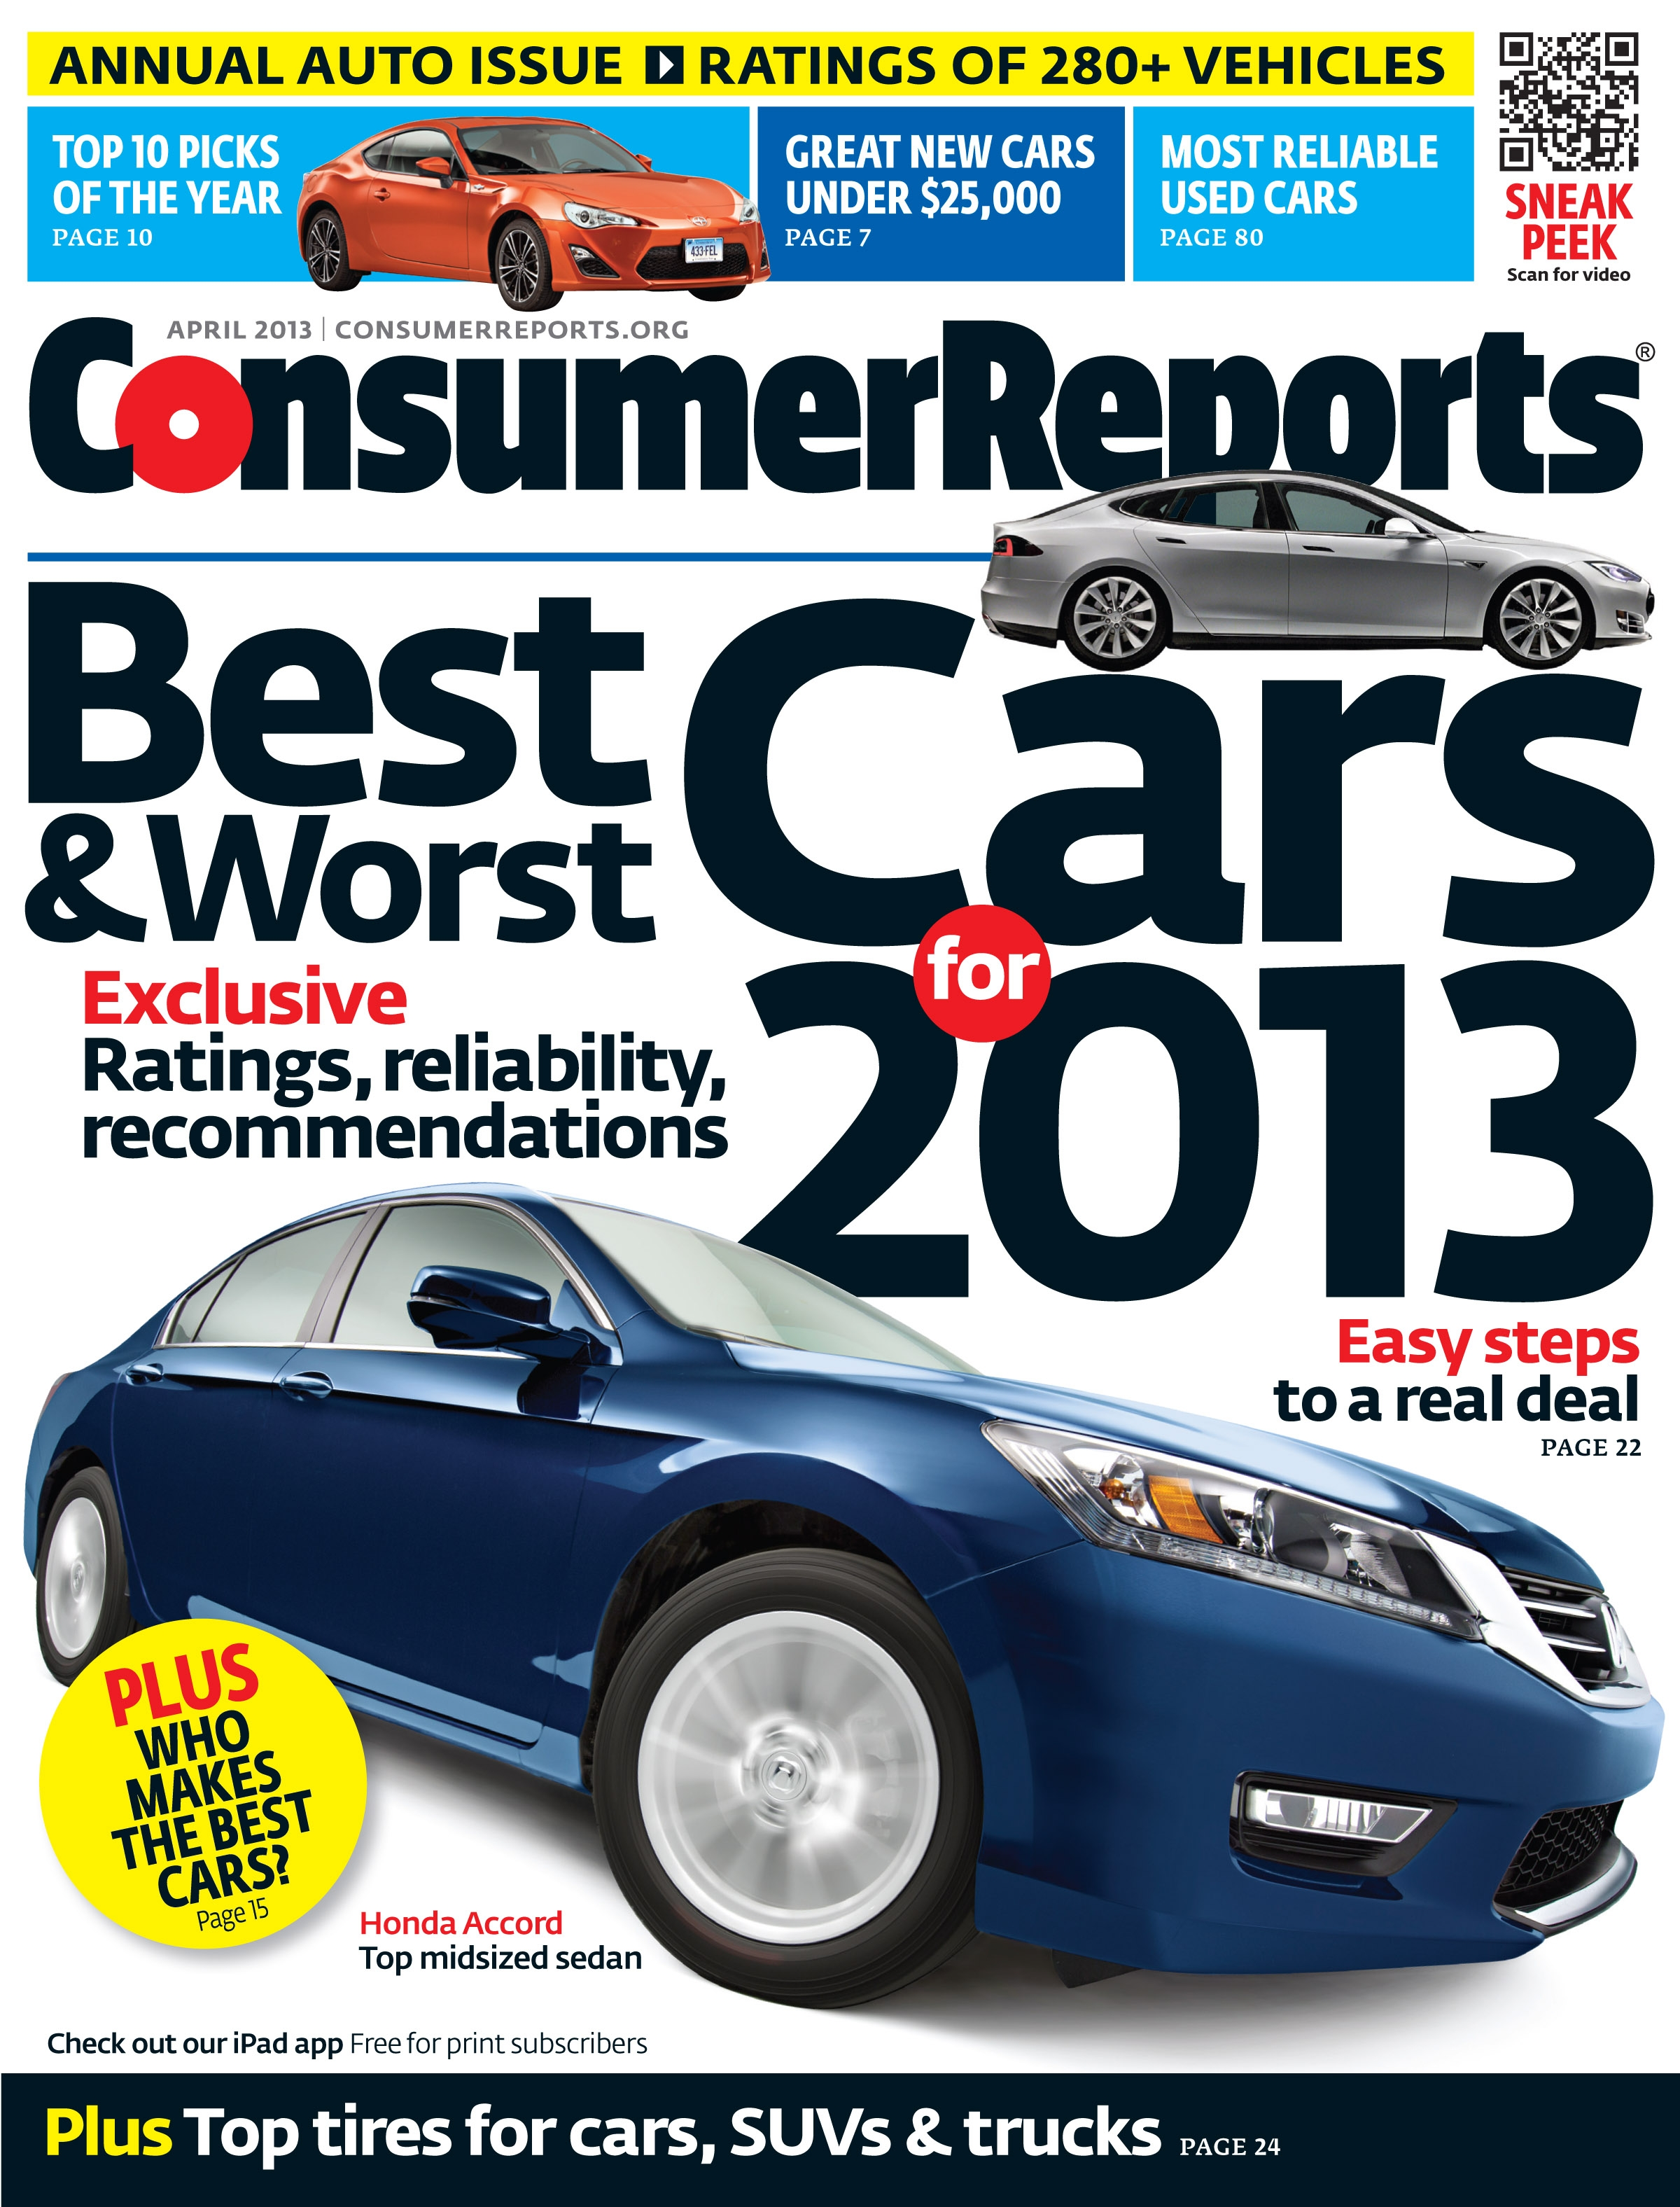 Consumer Reports Auto Issue